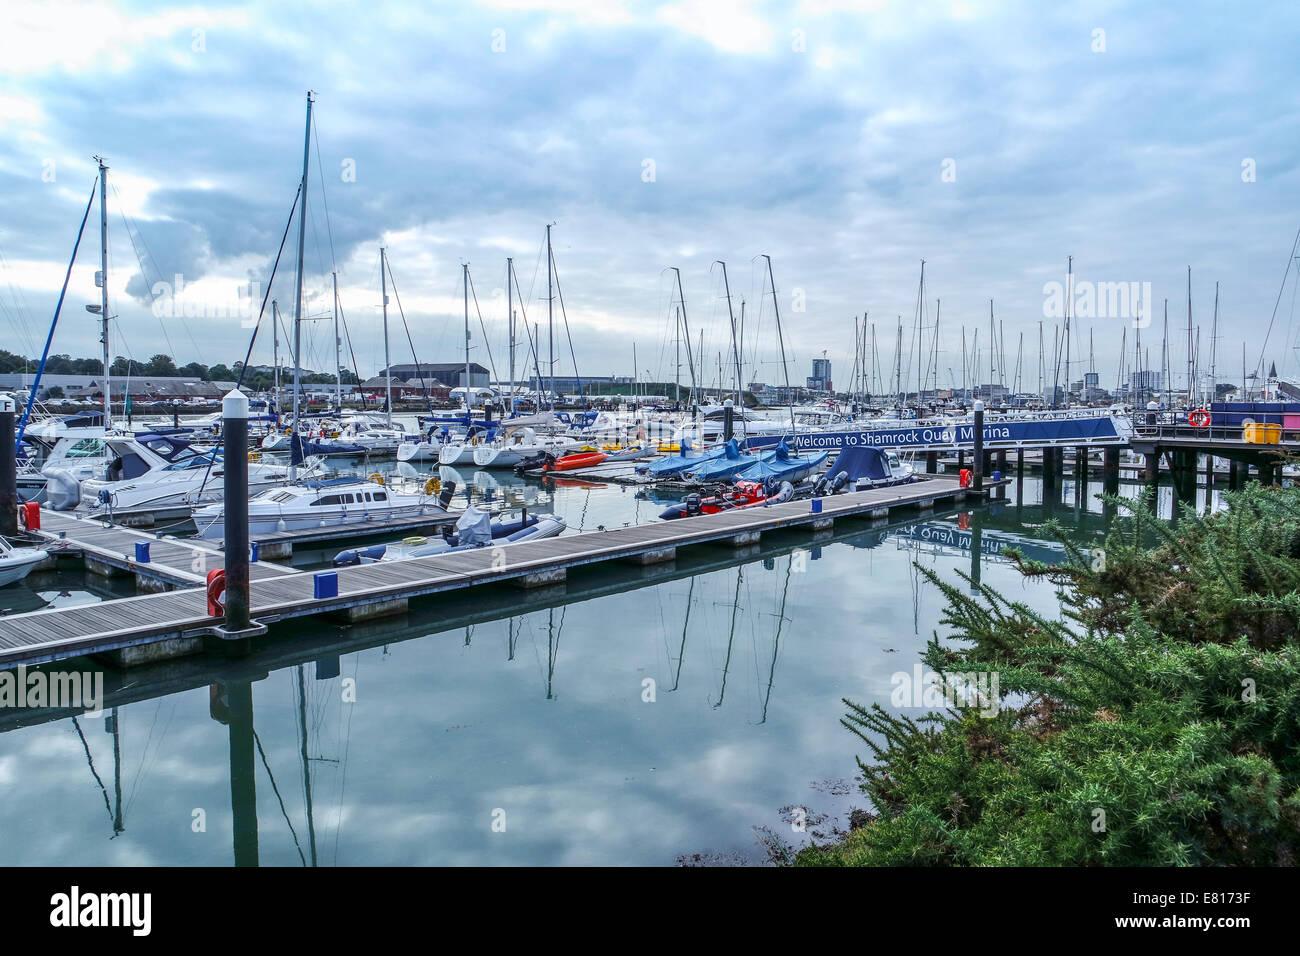 A view of Shamrock Quay Marina, Southampton - Stock Image